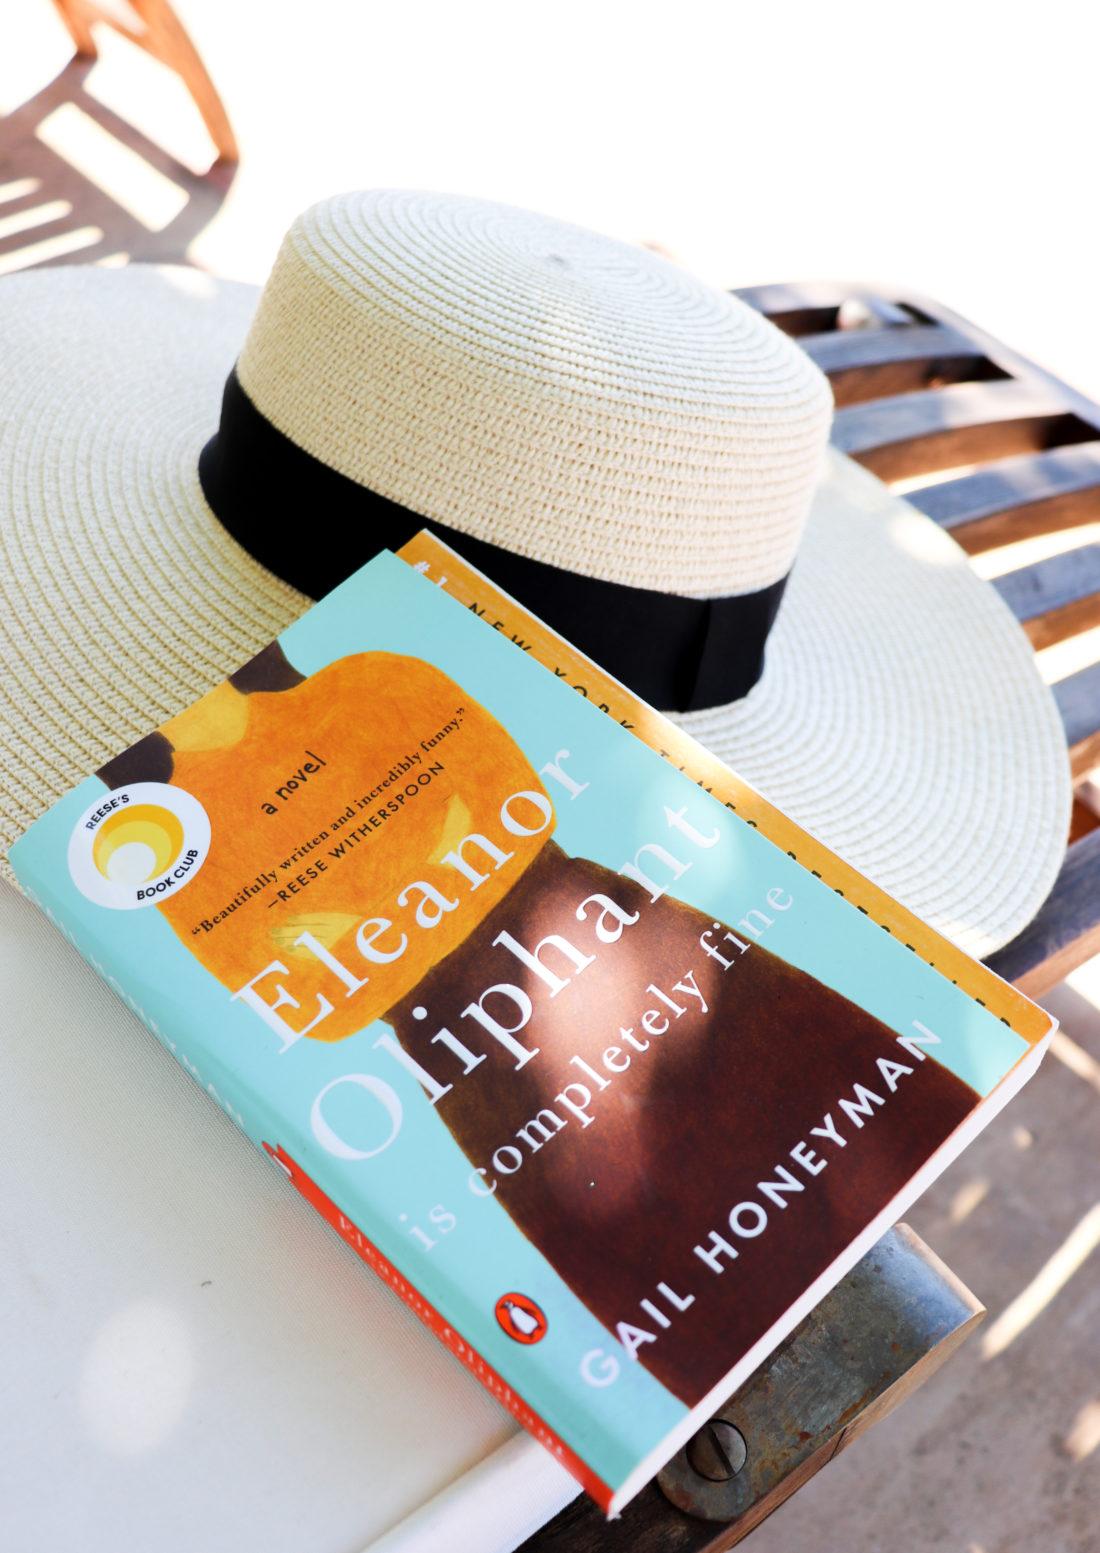 Eva Amurri Martino unveils her newest HEA Book Club pick: Eleanor Oliphant is Completely Fine